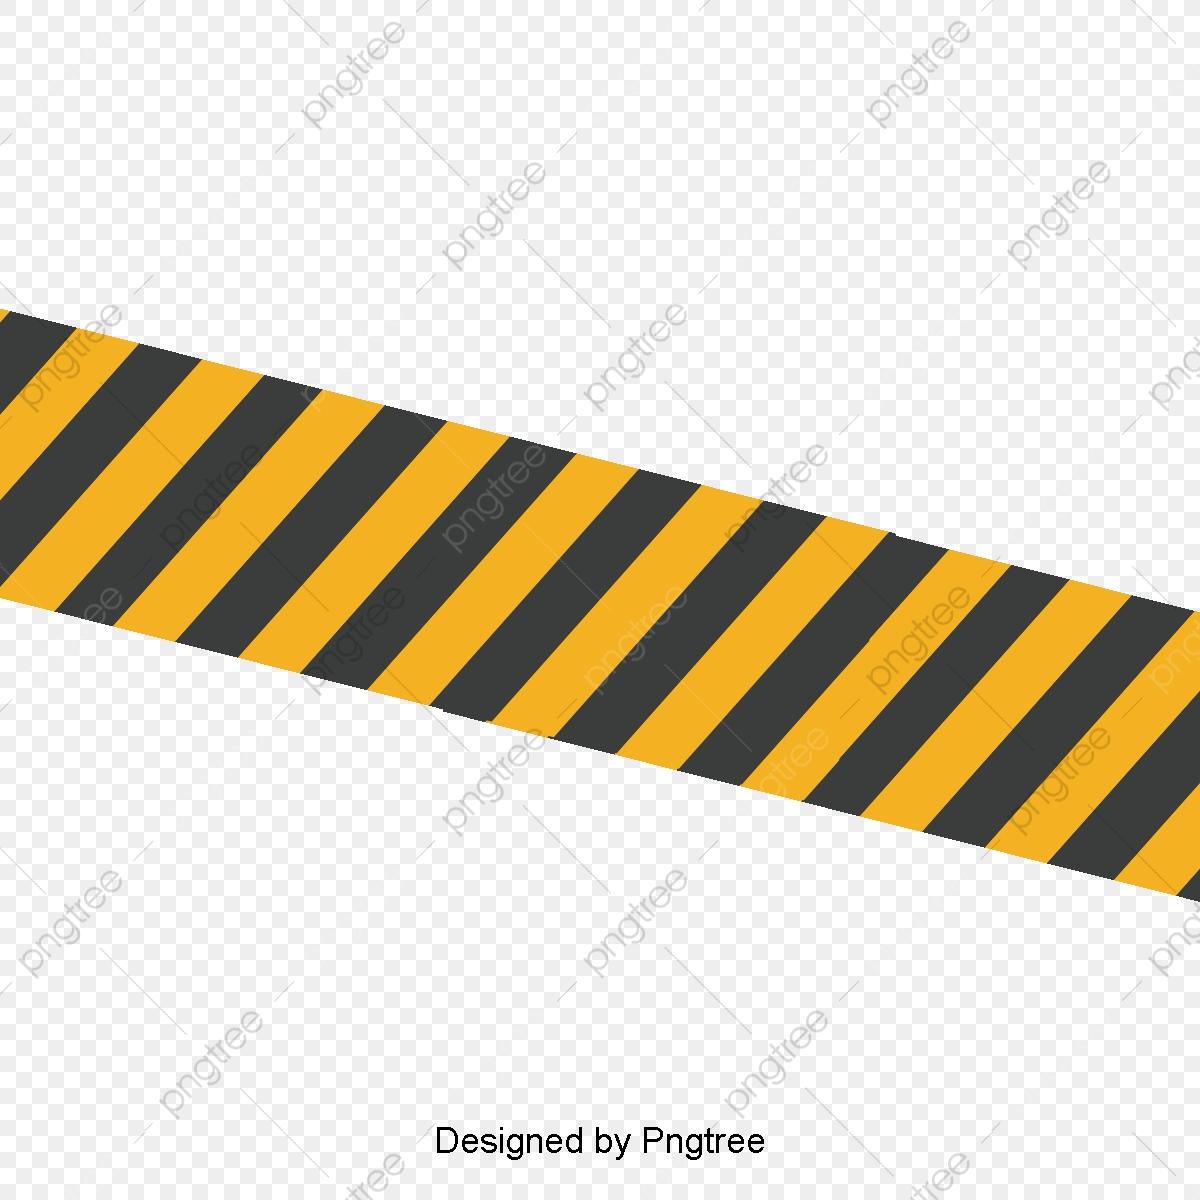 Vector Yellow Black Belt Alert, Barrier, Warning Tape, Caution Tape.